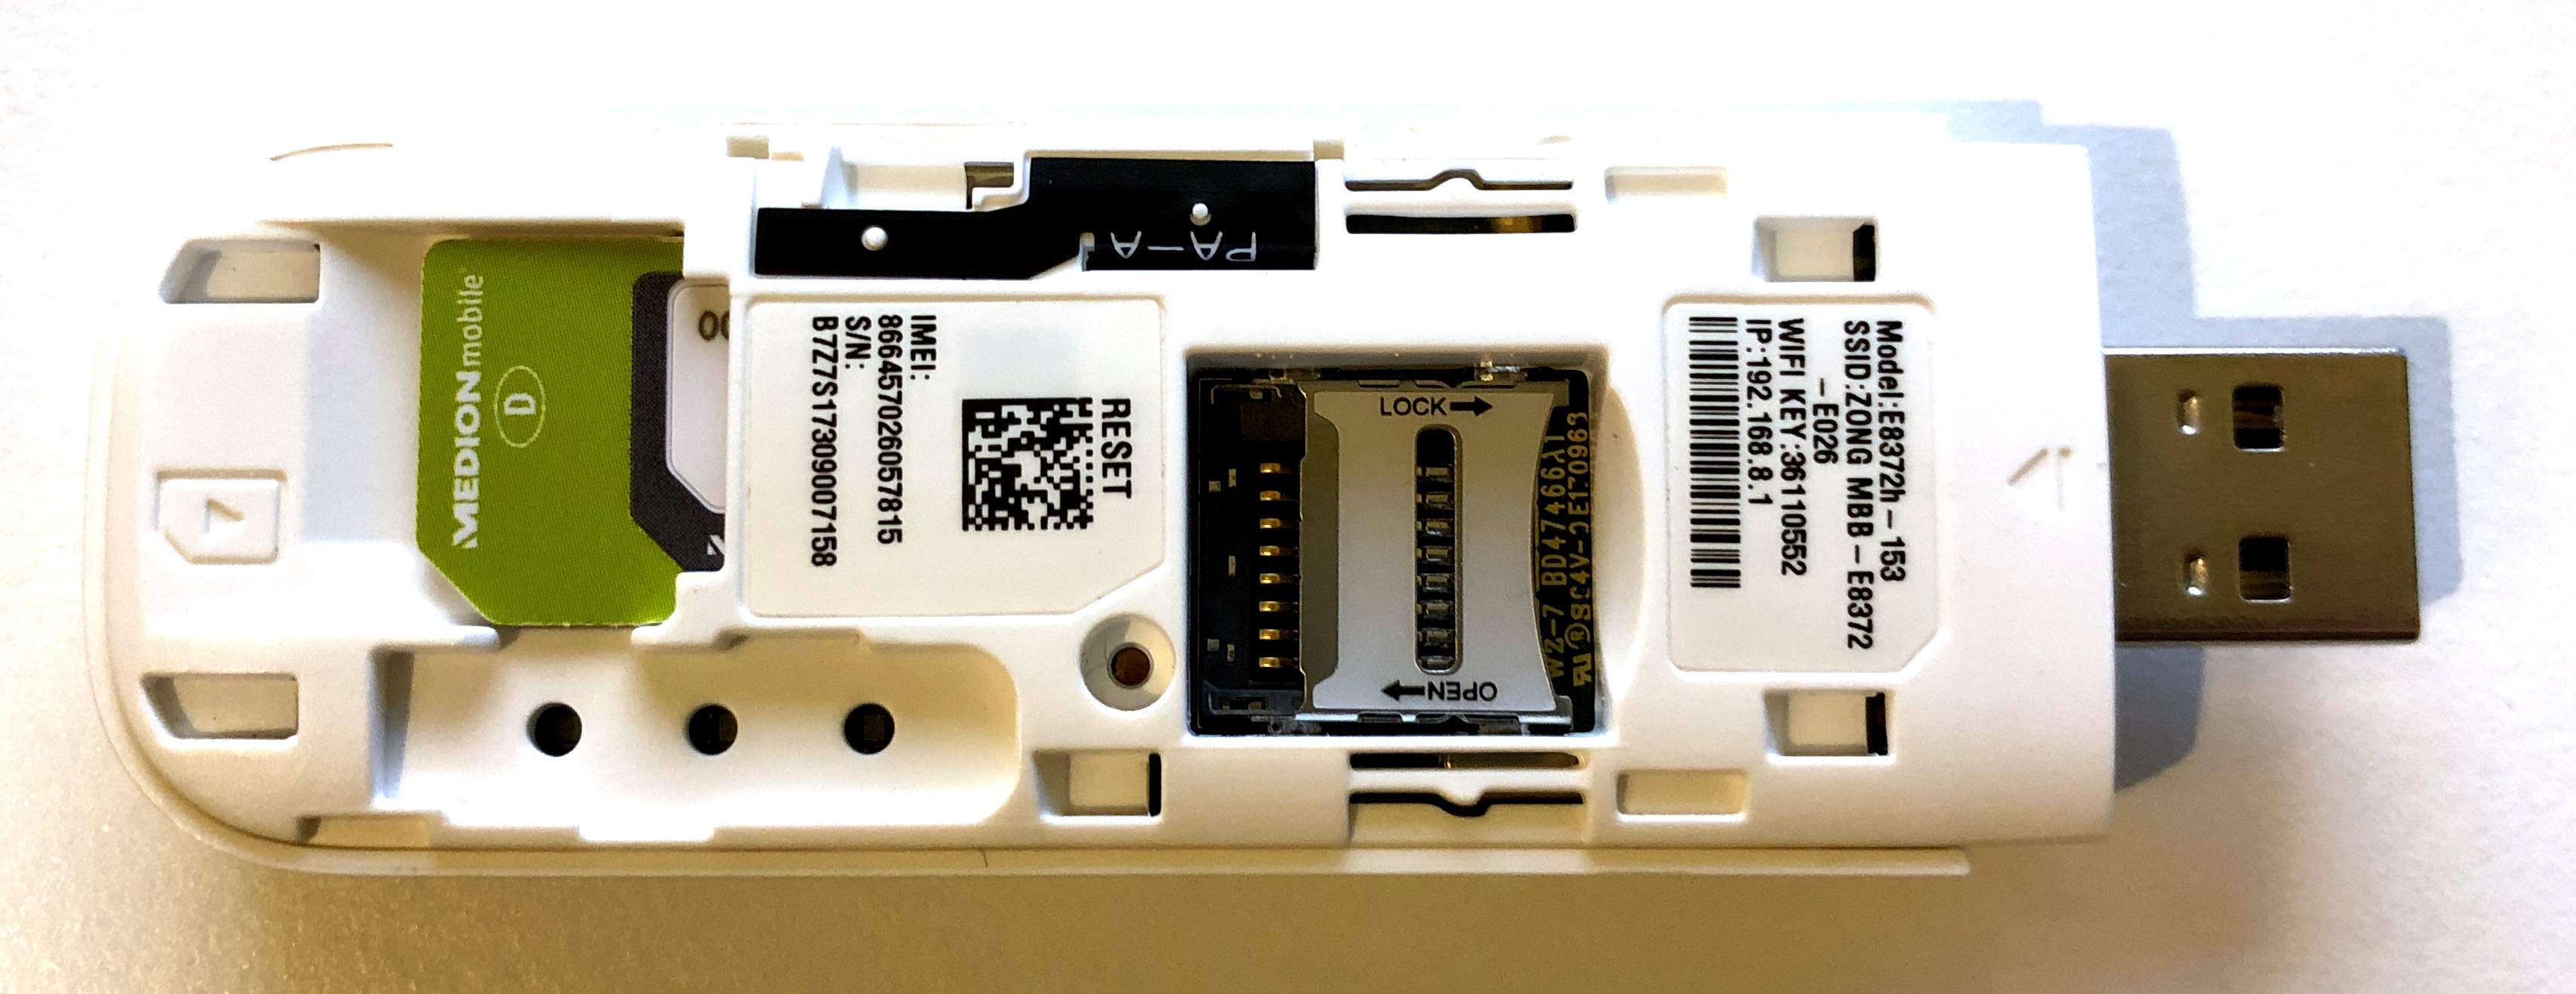 Mobiler Hotspot Huawei E8372 USB-Stick mit W-Lan und LTE